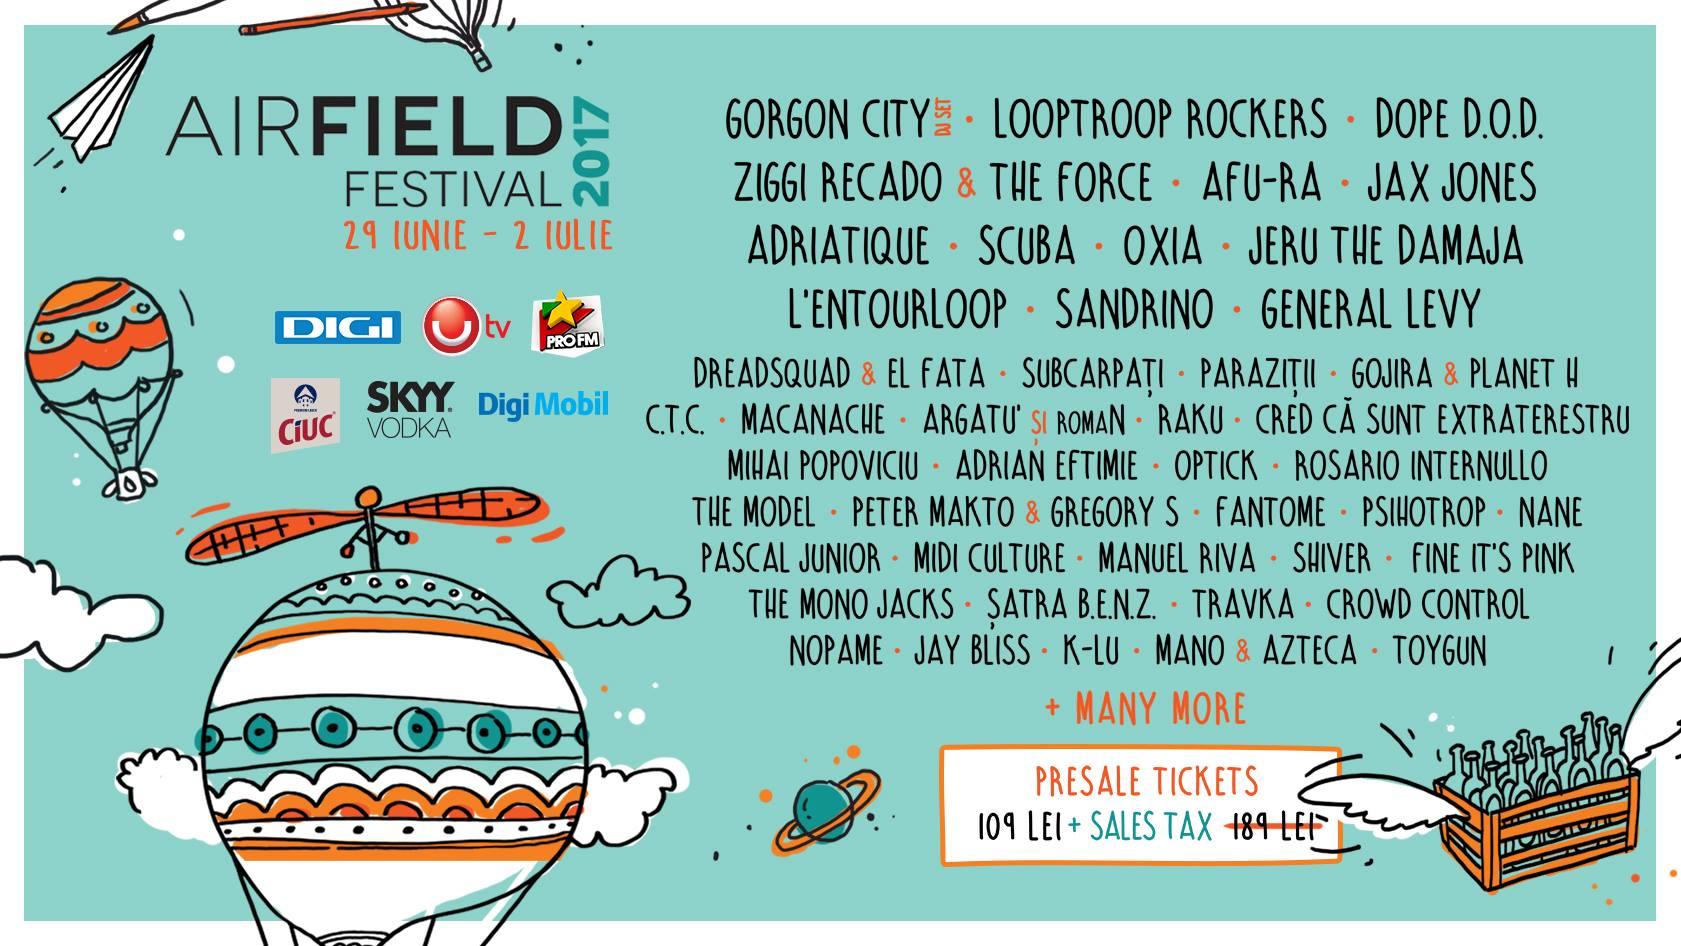 Airfield Festival 2017